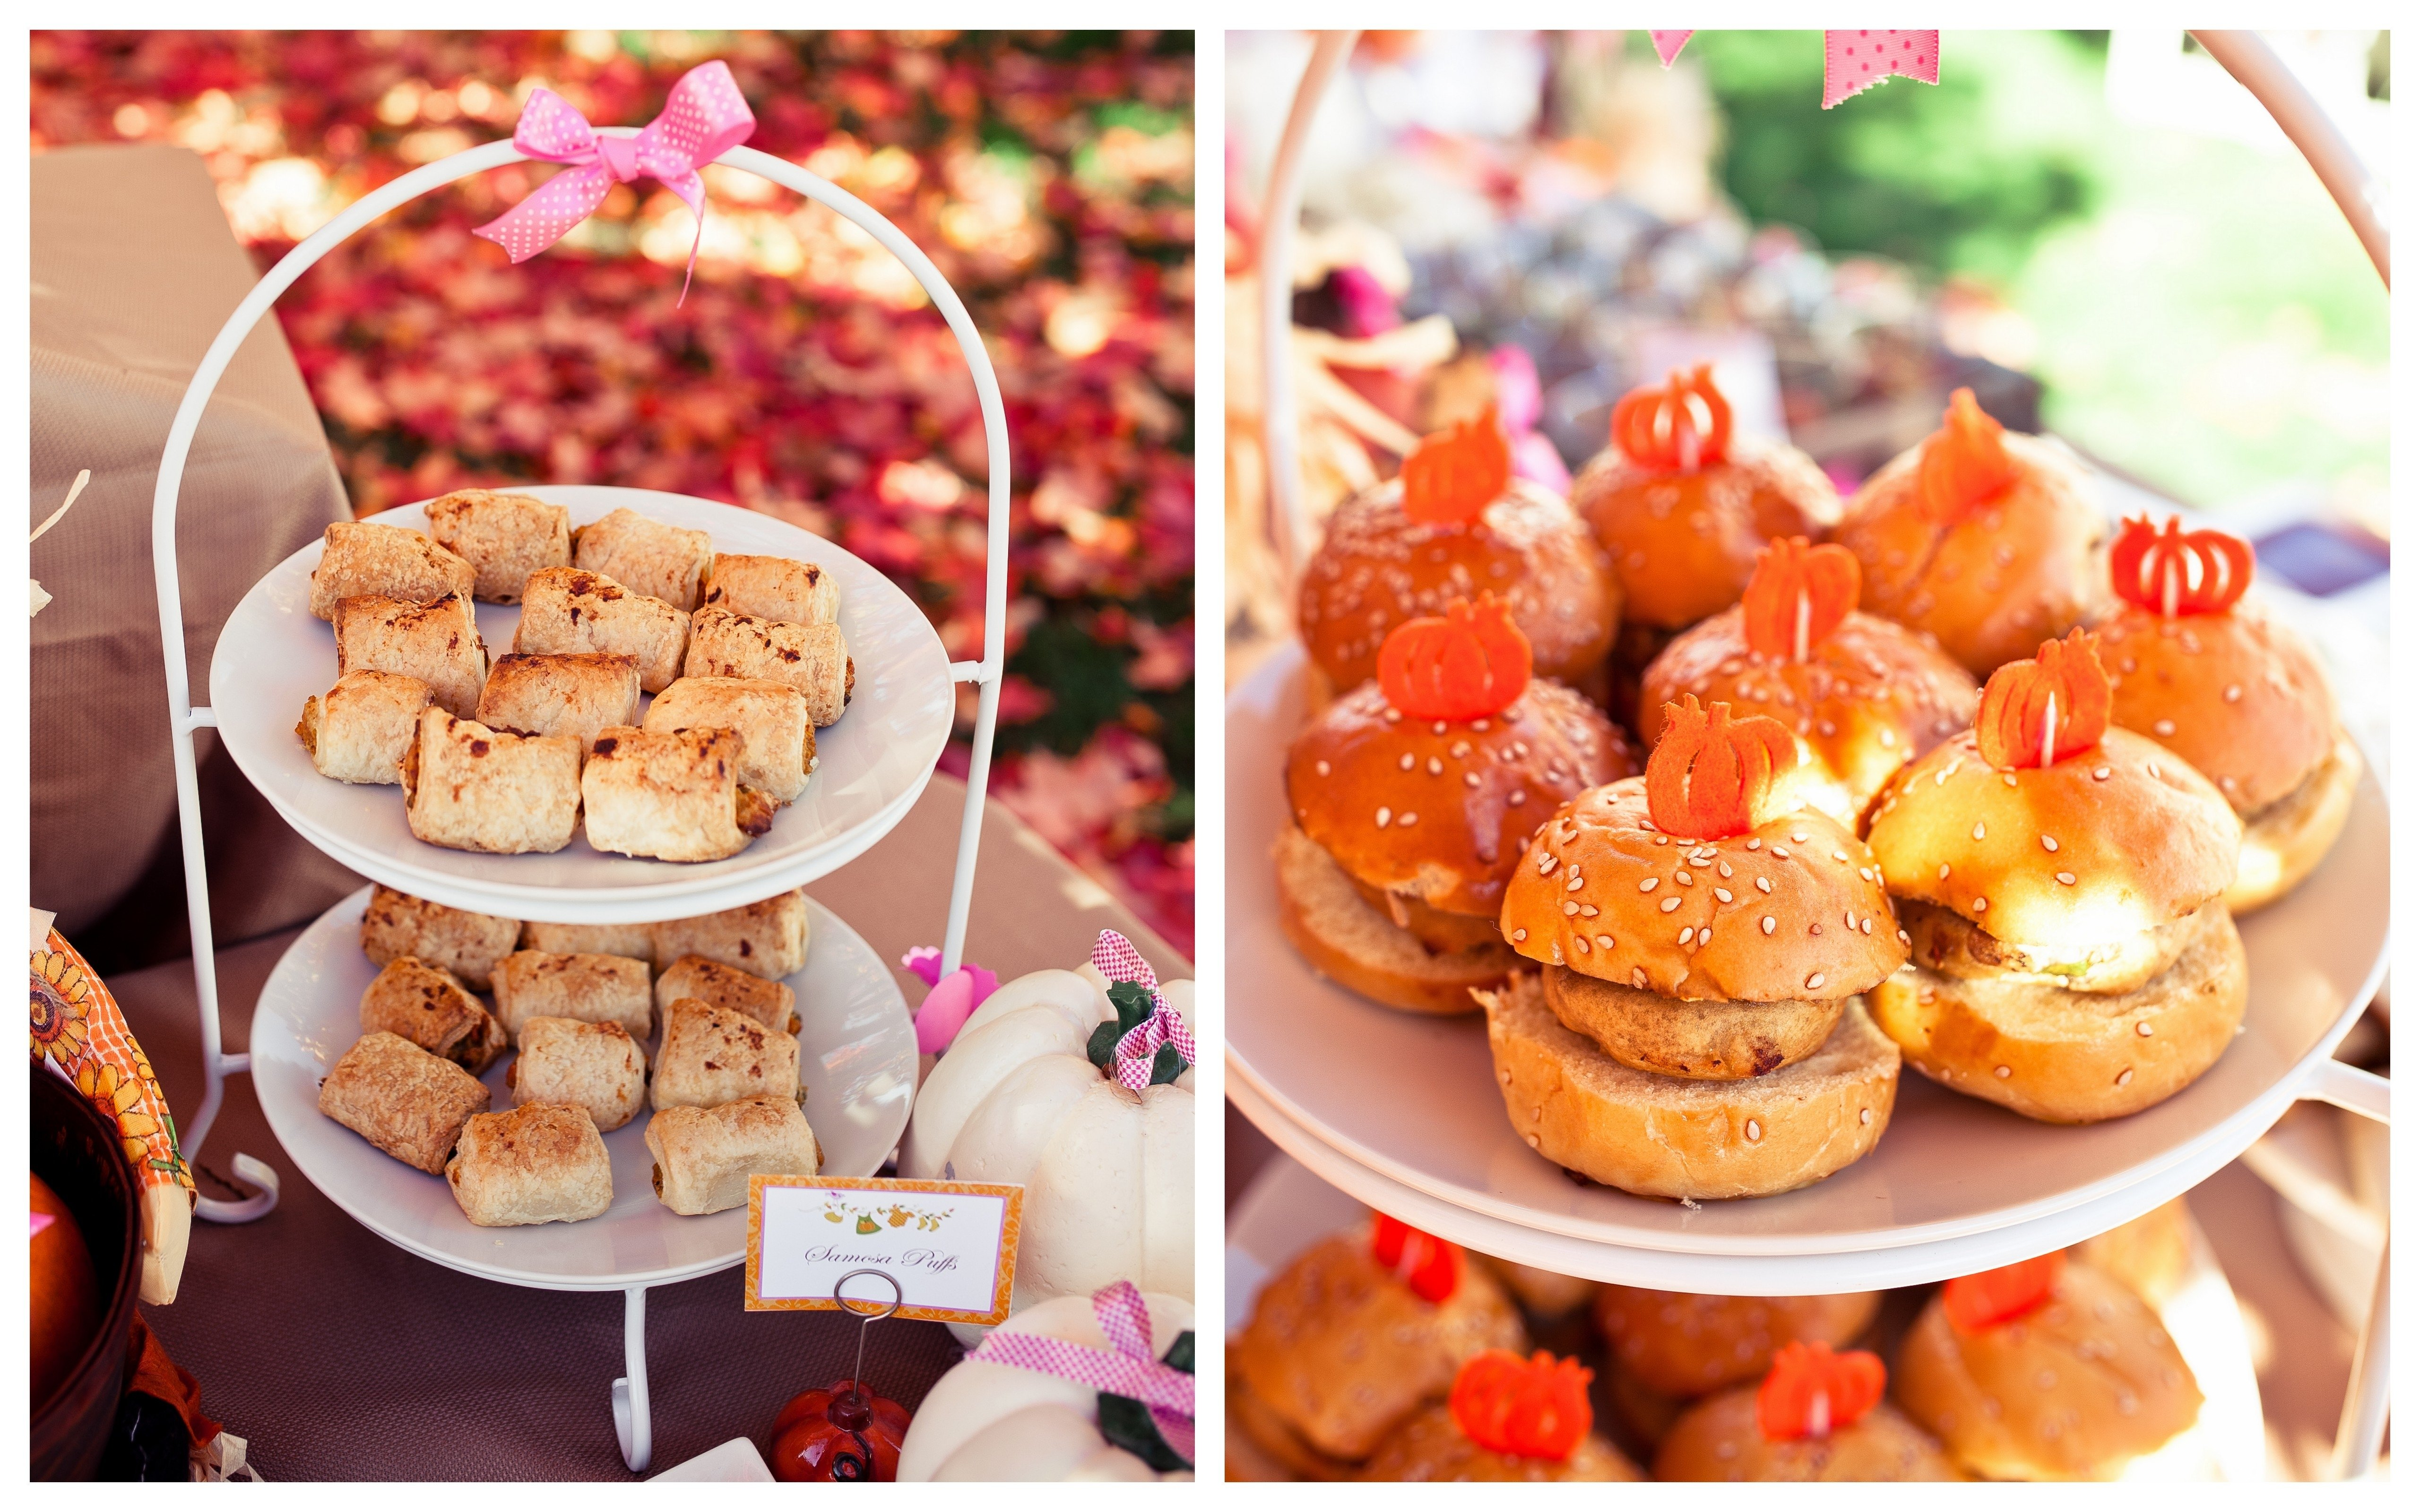 10 Elegant Brunch Ideas For Baby Shower baby shower brunch menu ideas decorations invitations bridal games 1 2020